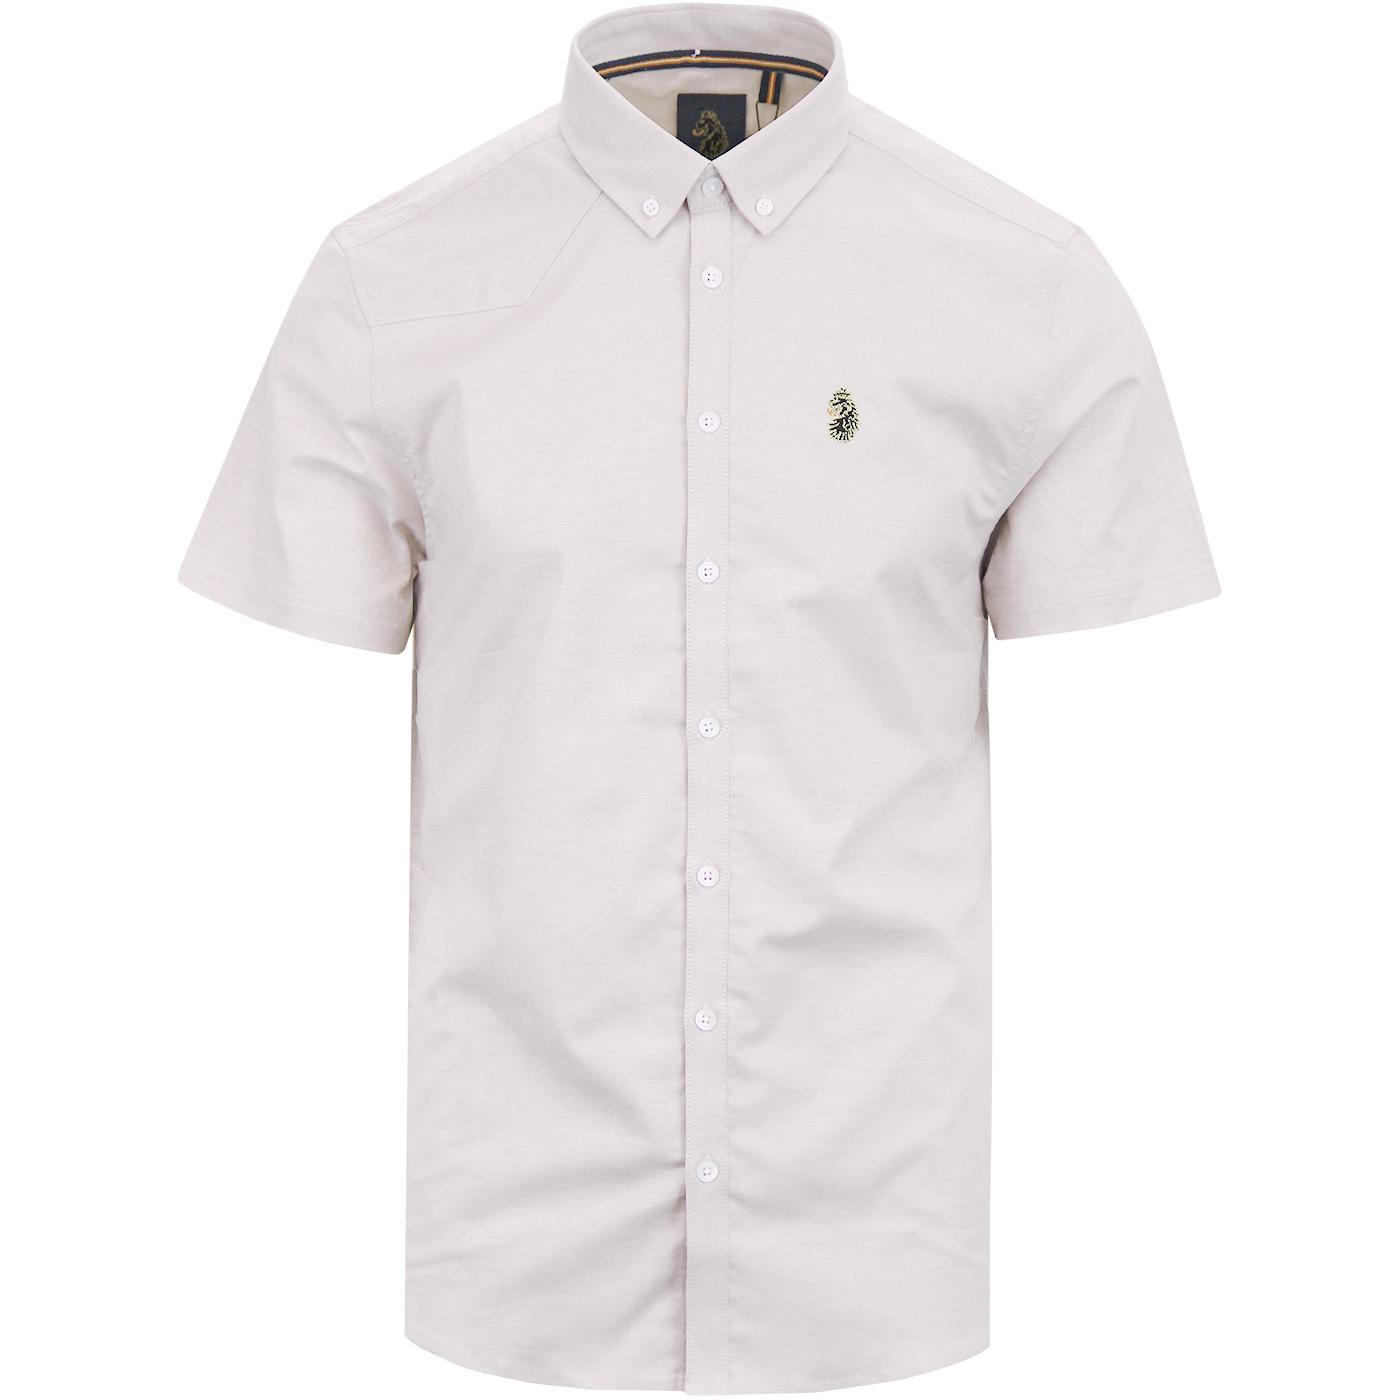 Jimmy Stretch LUKE Retro Slim Fit Oxford Shirt M